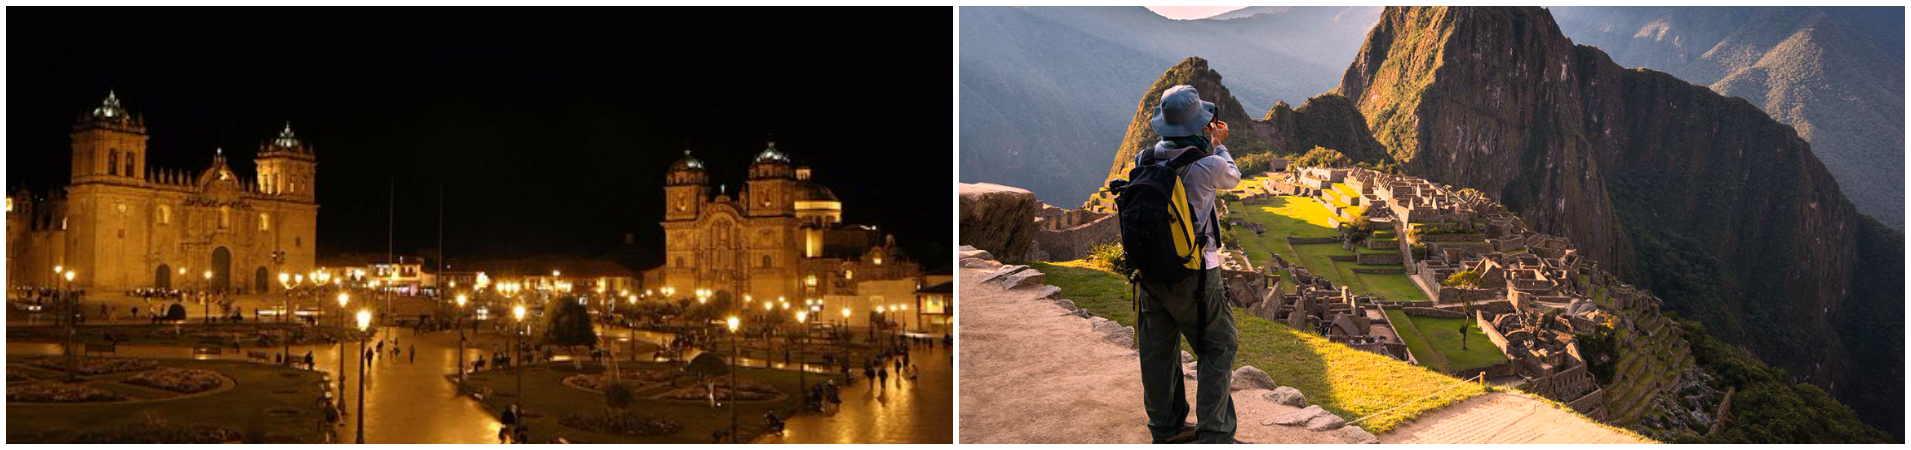 Tours Cusco Machu Picchu Magico 3 dias